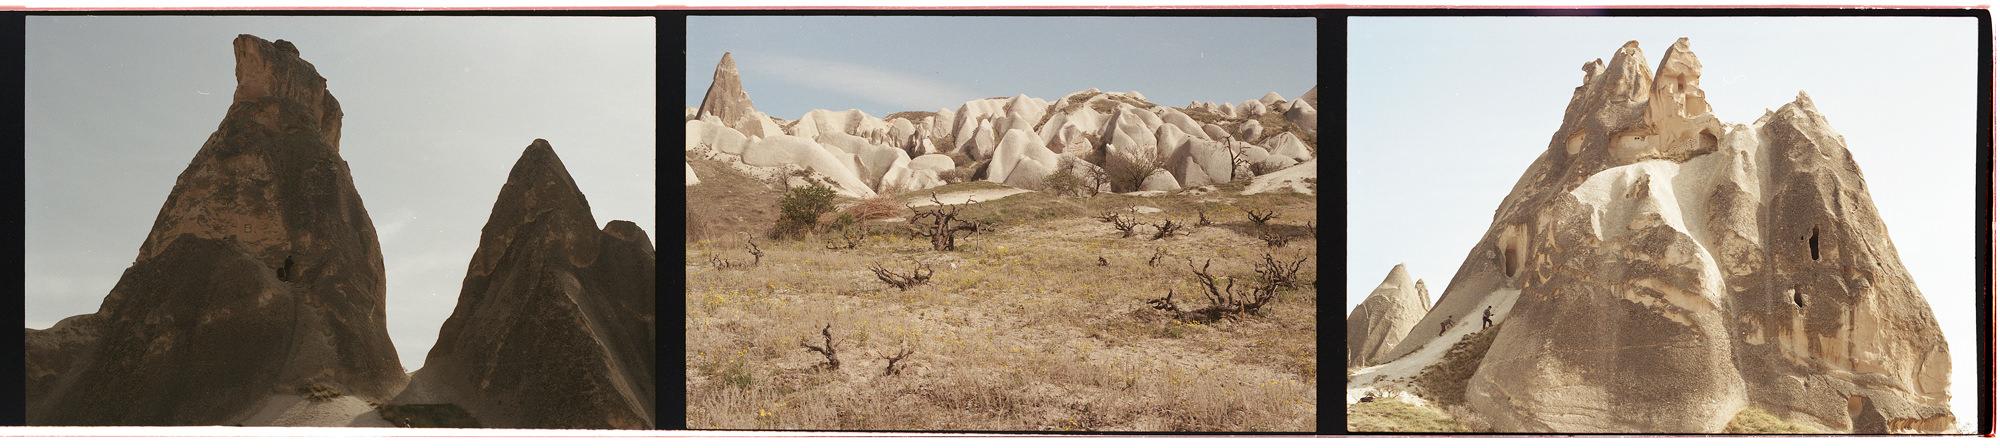 35mmPatrikWallner_Cappadocia_RockClimbingLOWQ